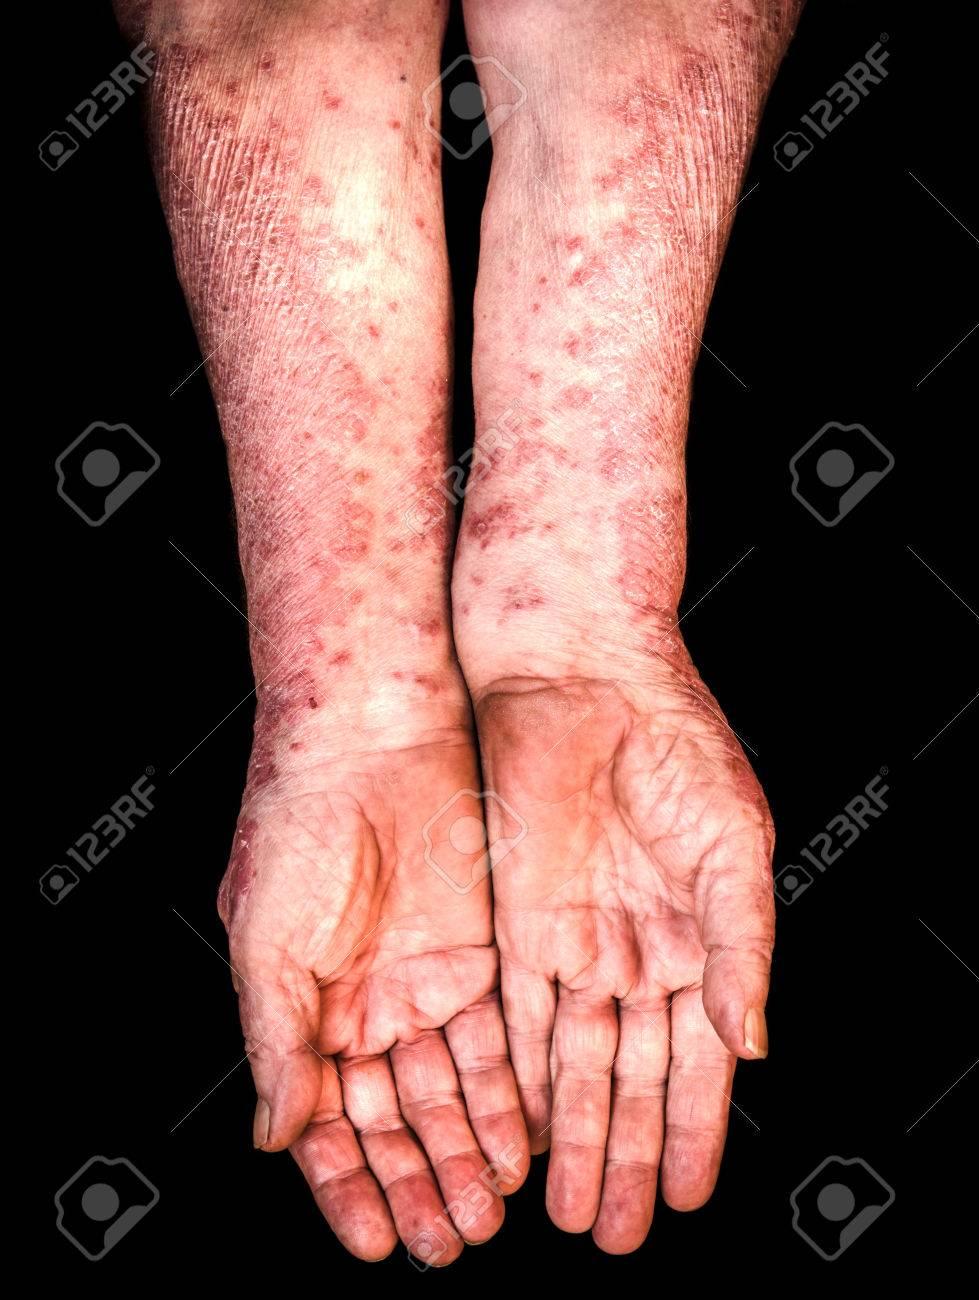 http://n3.datasn.io/data/api/v1/n3zm/image_of_skin_disease_5/by_table/skin_disease_image_download_access/9a/ac/95/b4/9aac95b464df82b64678e2504782292995e9b7fb.jpg